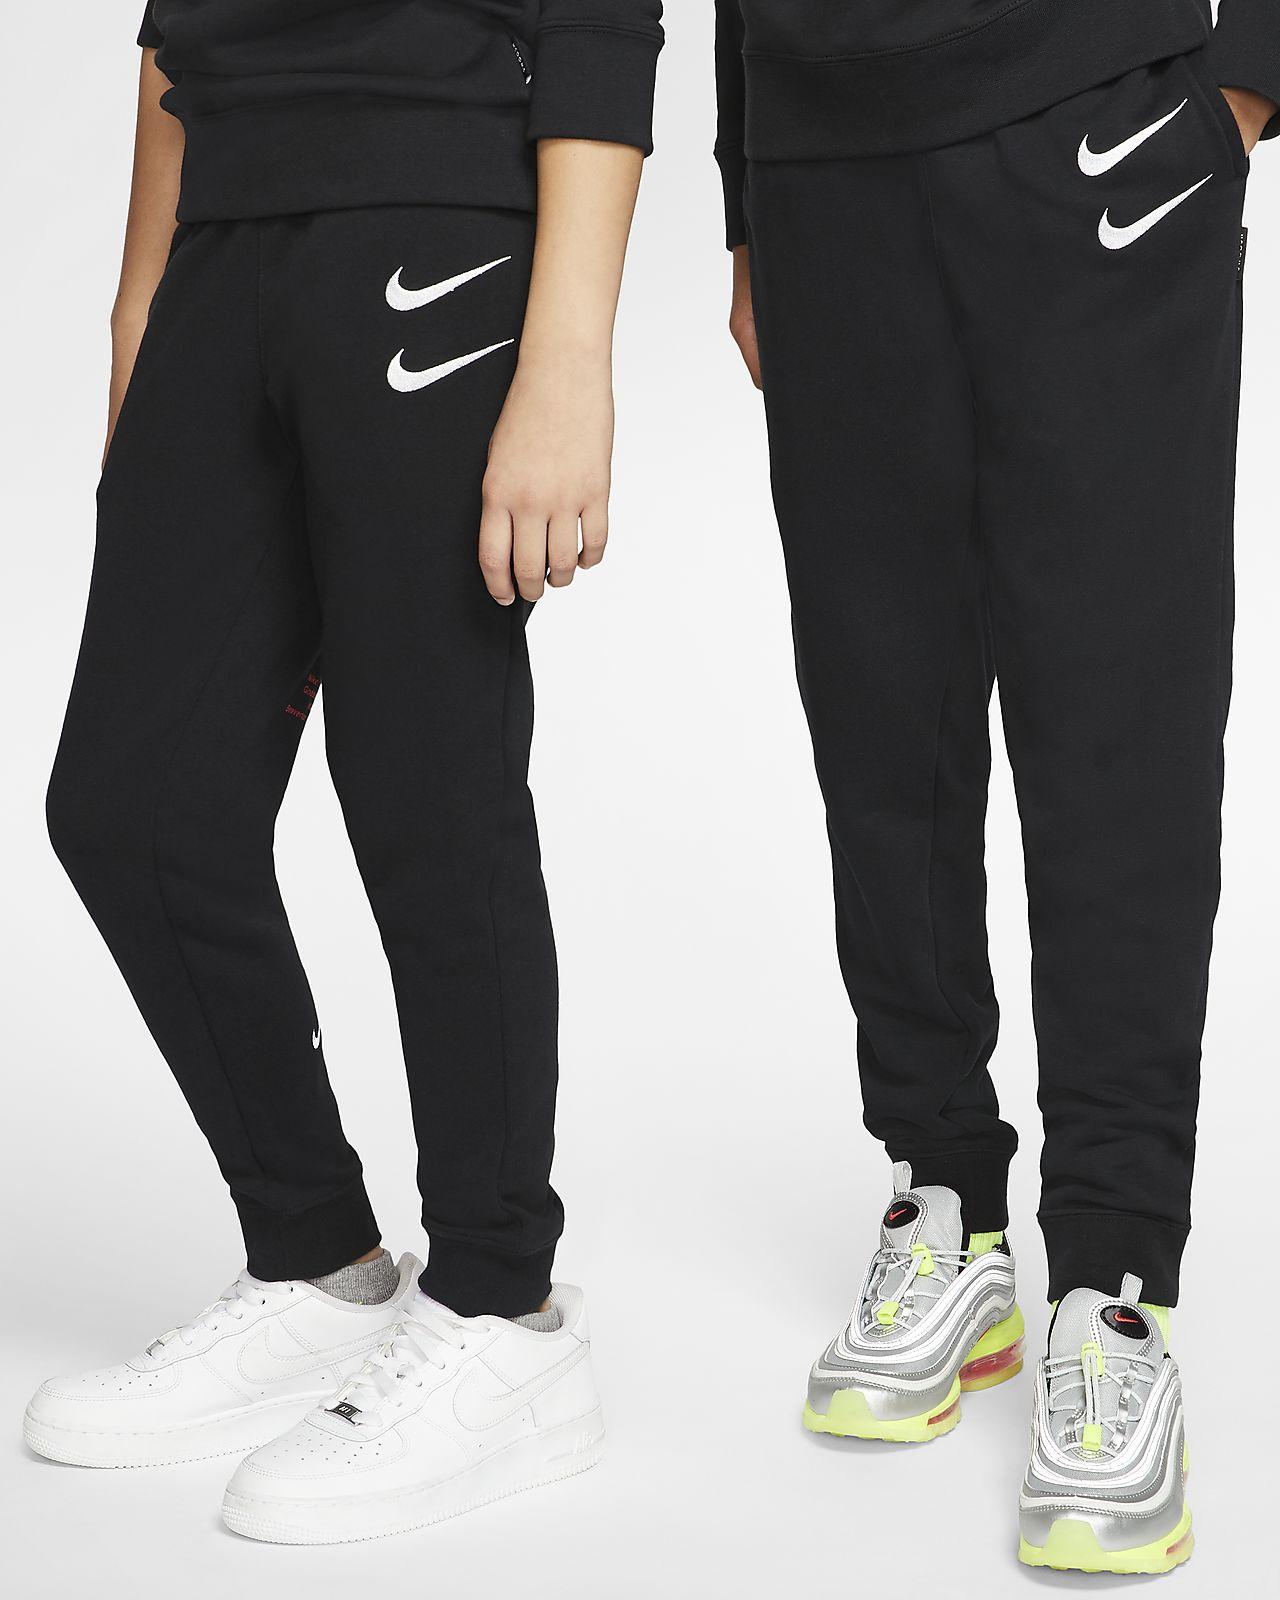 Nike Sportswear Swoosh French-Terry-Hose für ältere Kinder